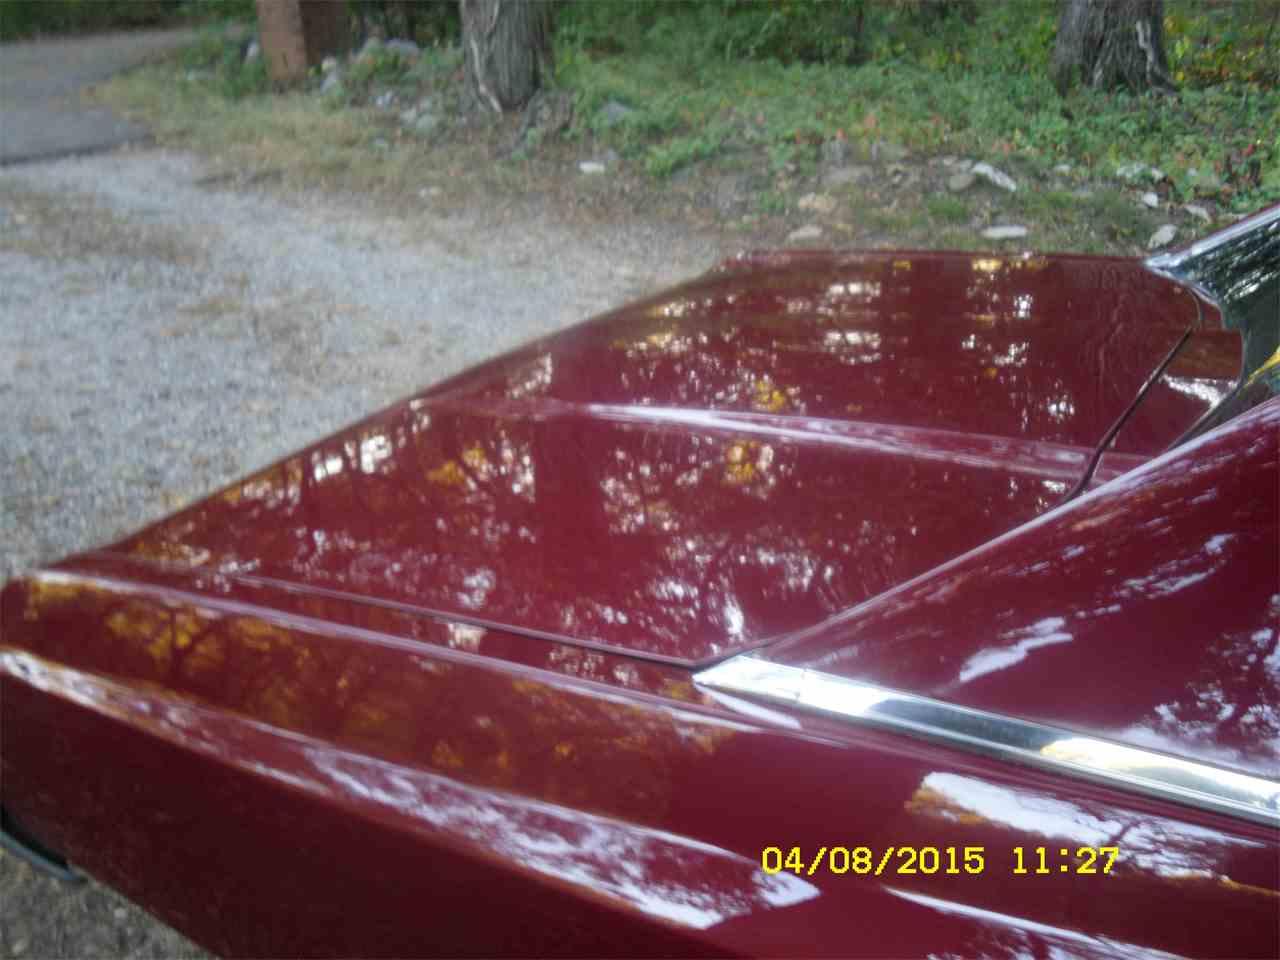 Large Picture of Classic '73 Chevrolet Impala - JIZ7